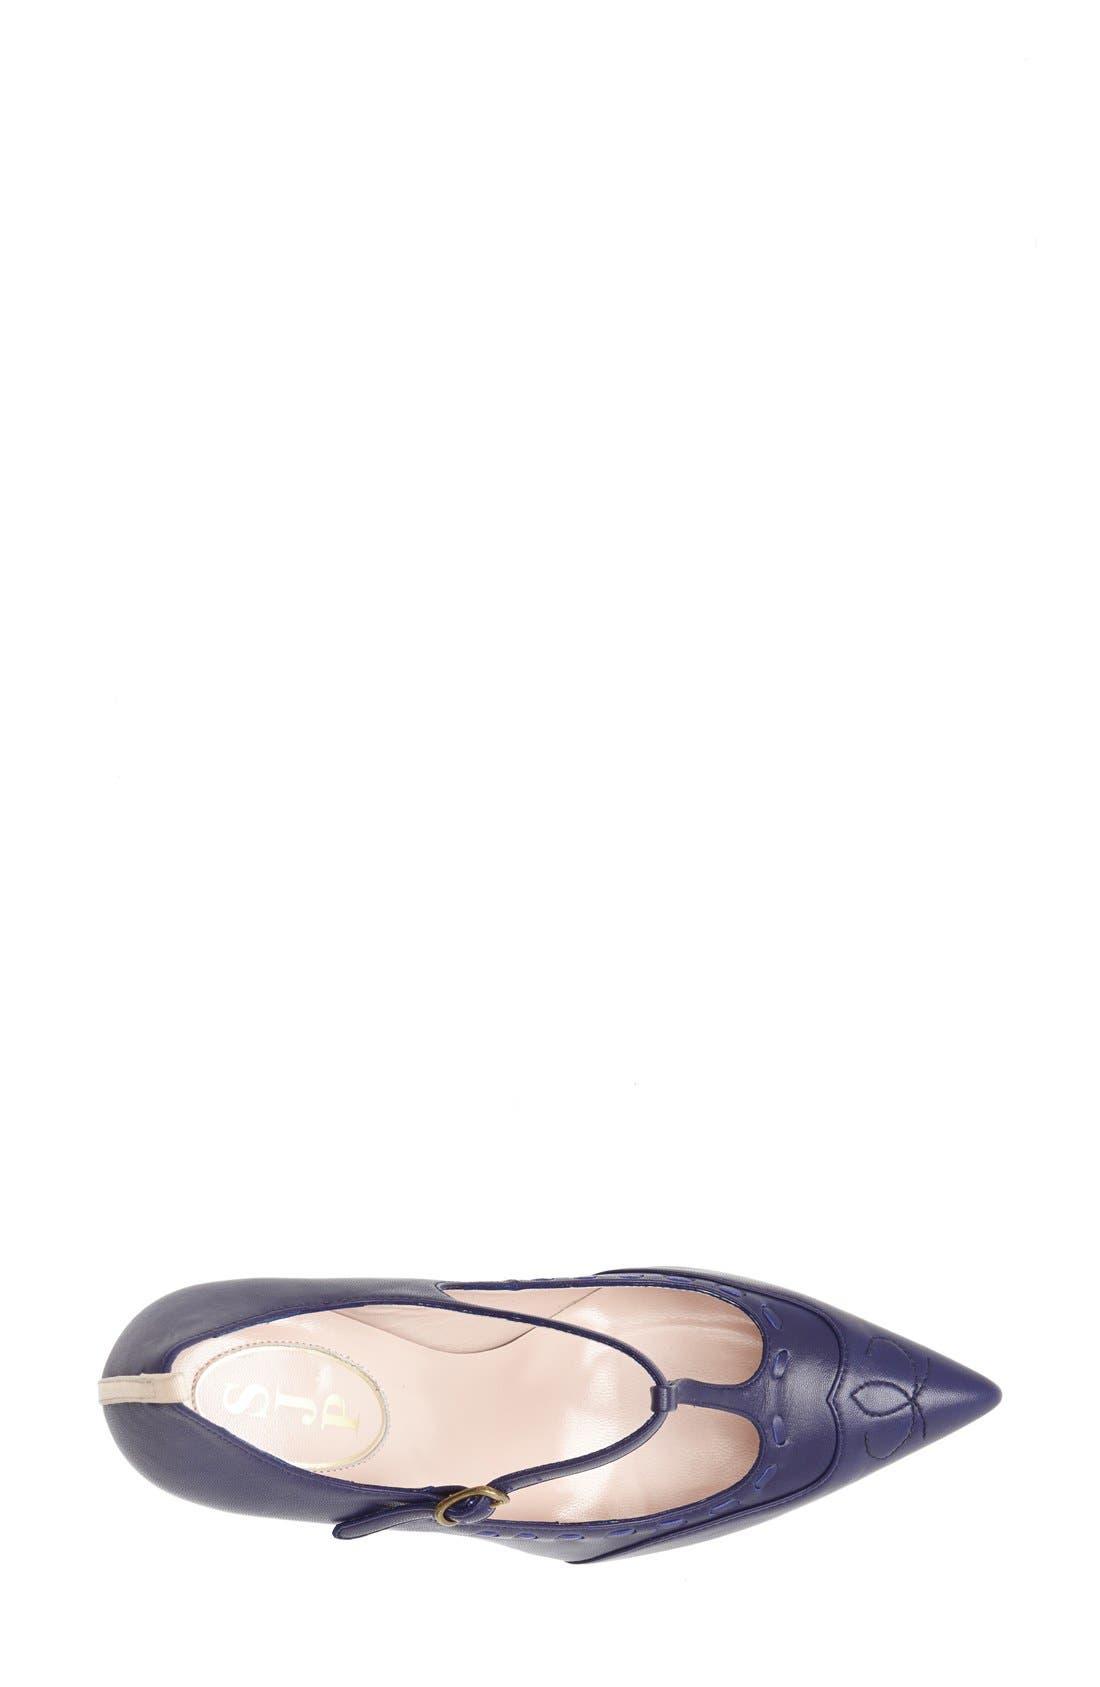 Alternate Image 4  - SJP 'Blythe' Leather T-Strap Mary Jane Pump (Women)